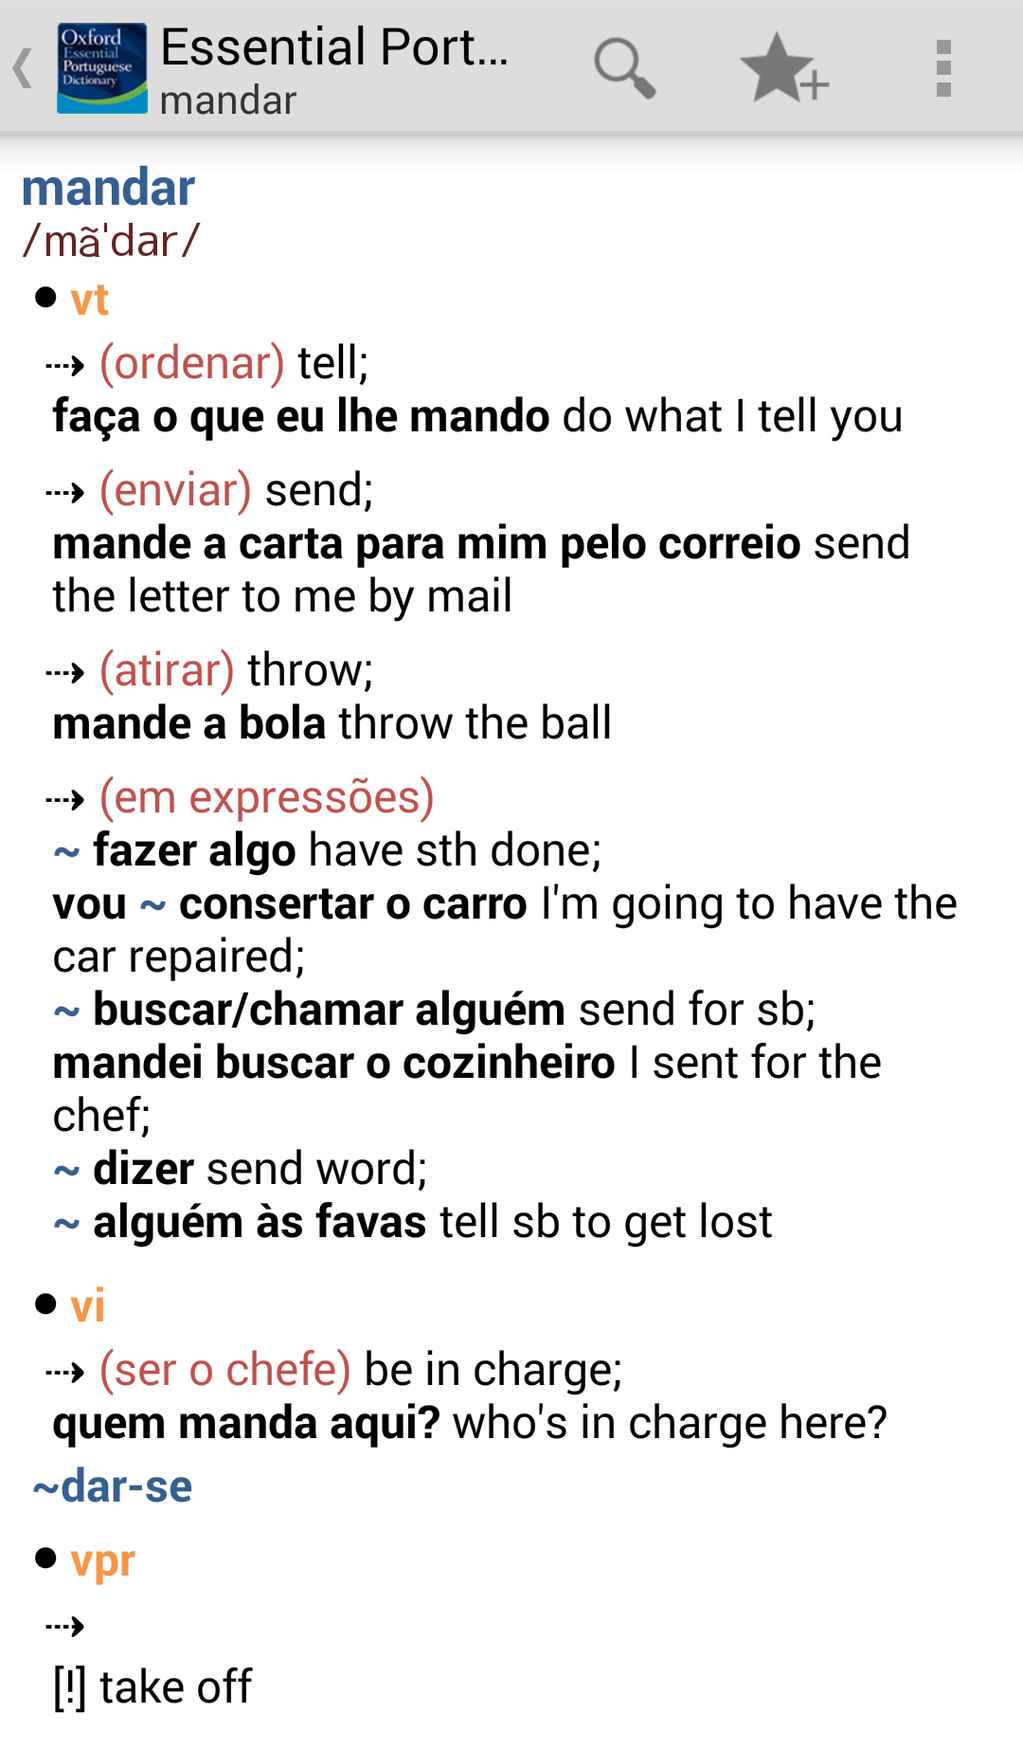 Oxford Essential Portuguese Dictionary Screenshot 3